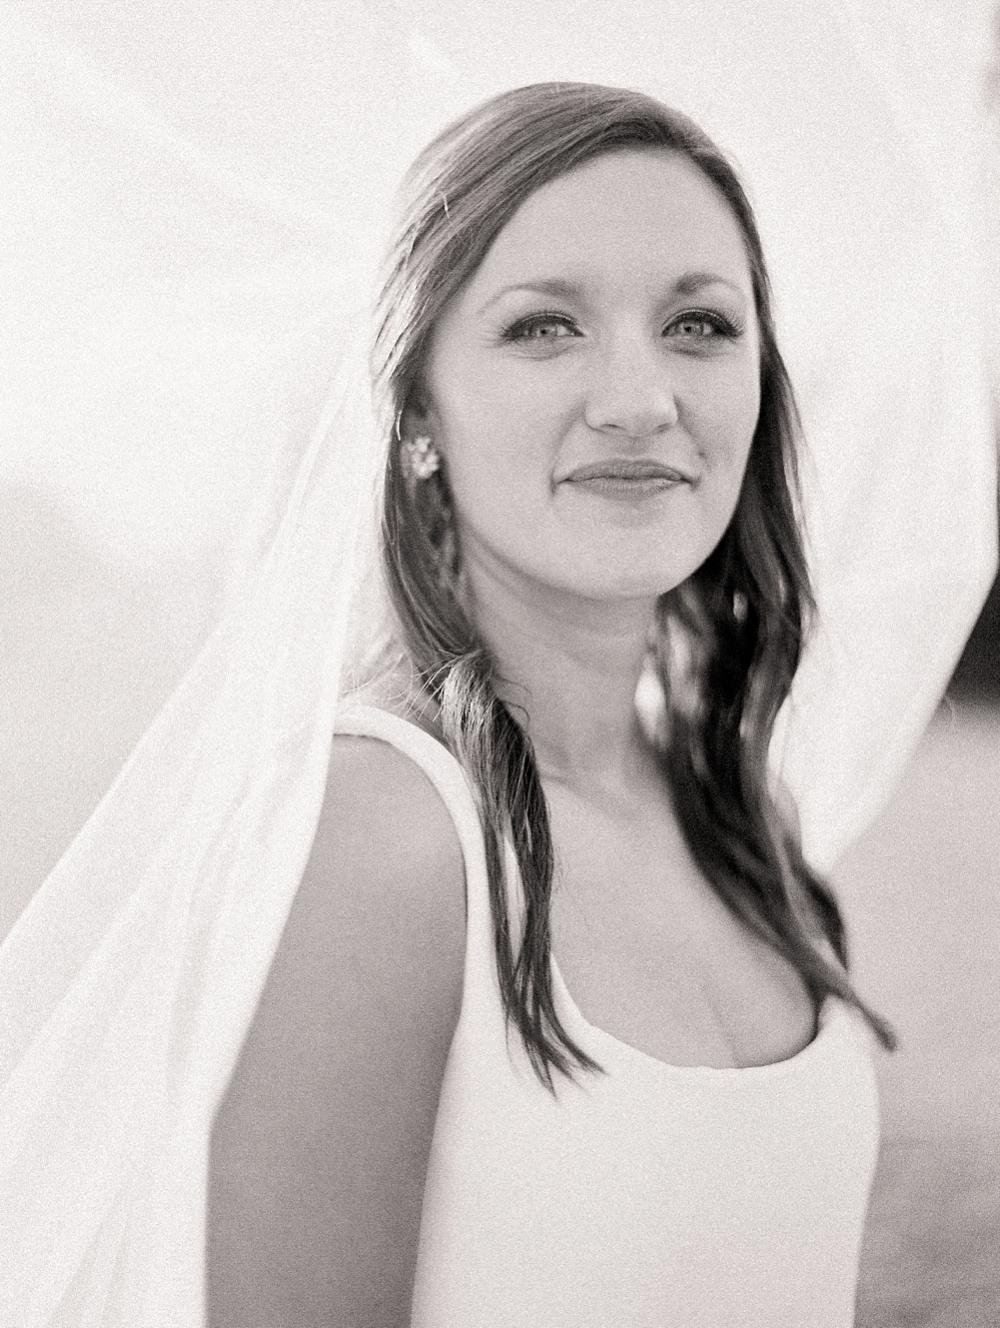 Kristin-La-Voie-Photography-austin-houston-texas-wedding-photographer-the-oaks-at-high-hill -21